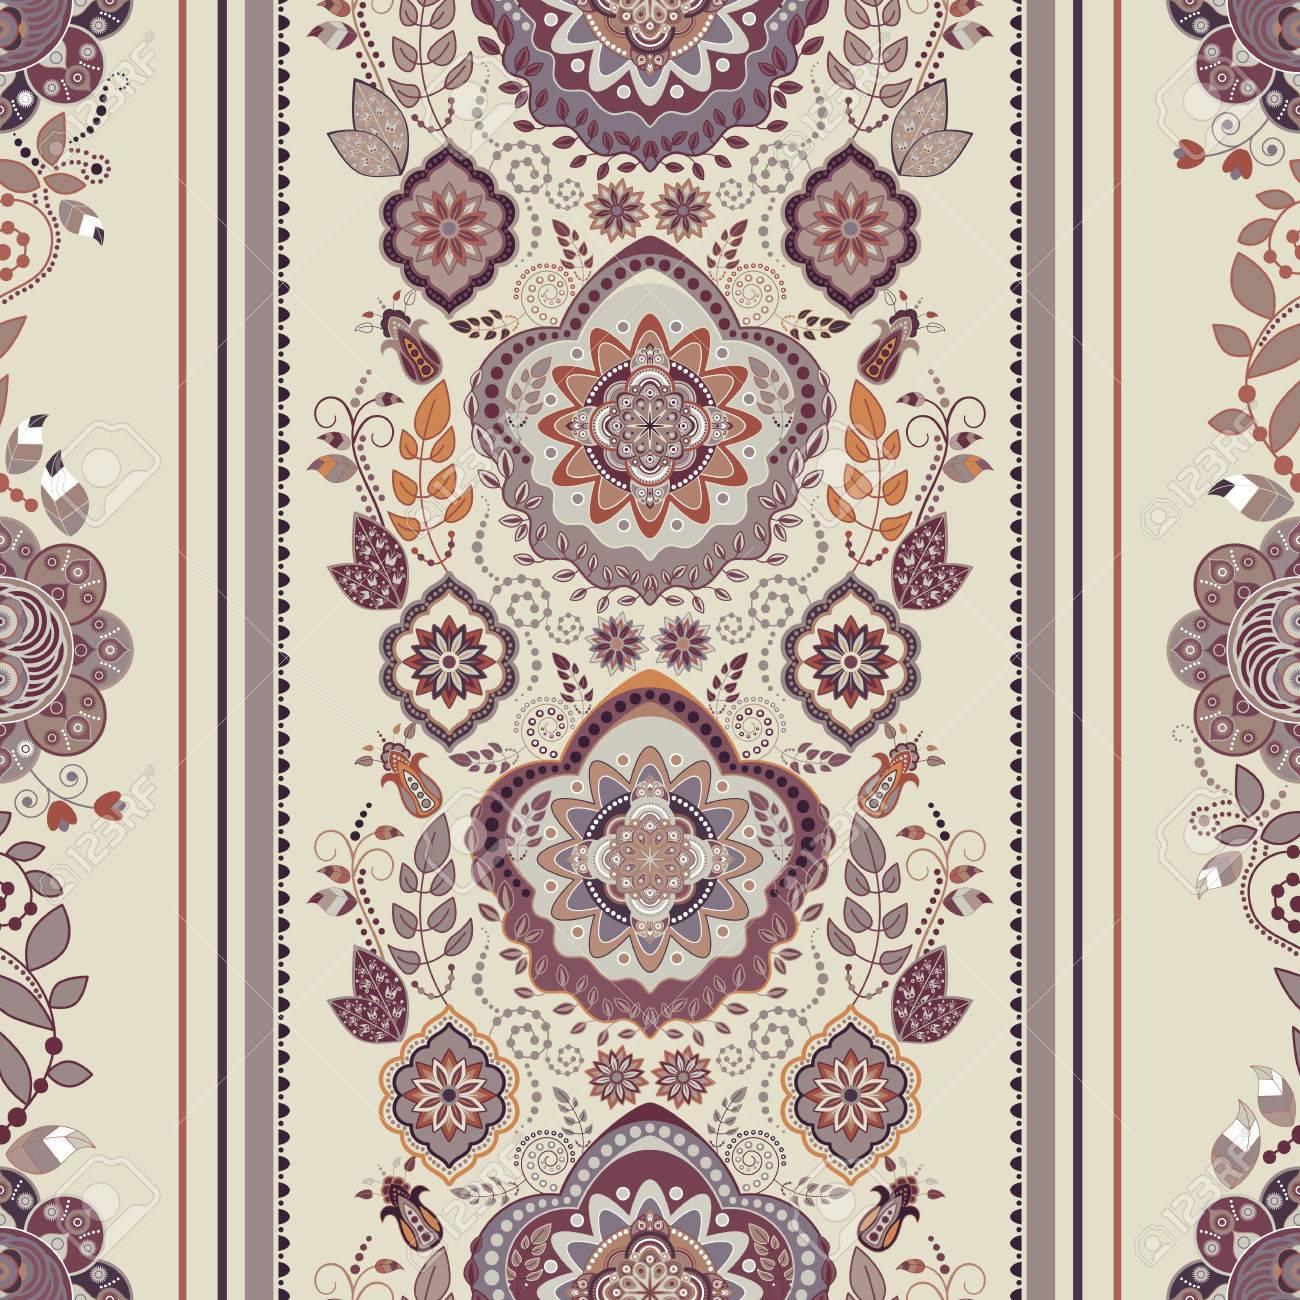 Striped Floral Pattern Decorative Ornamental Wallpaper Floral